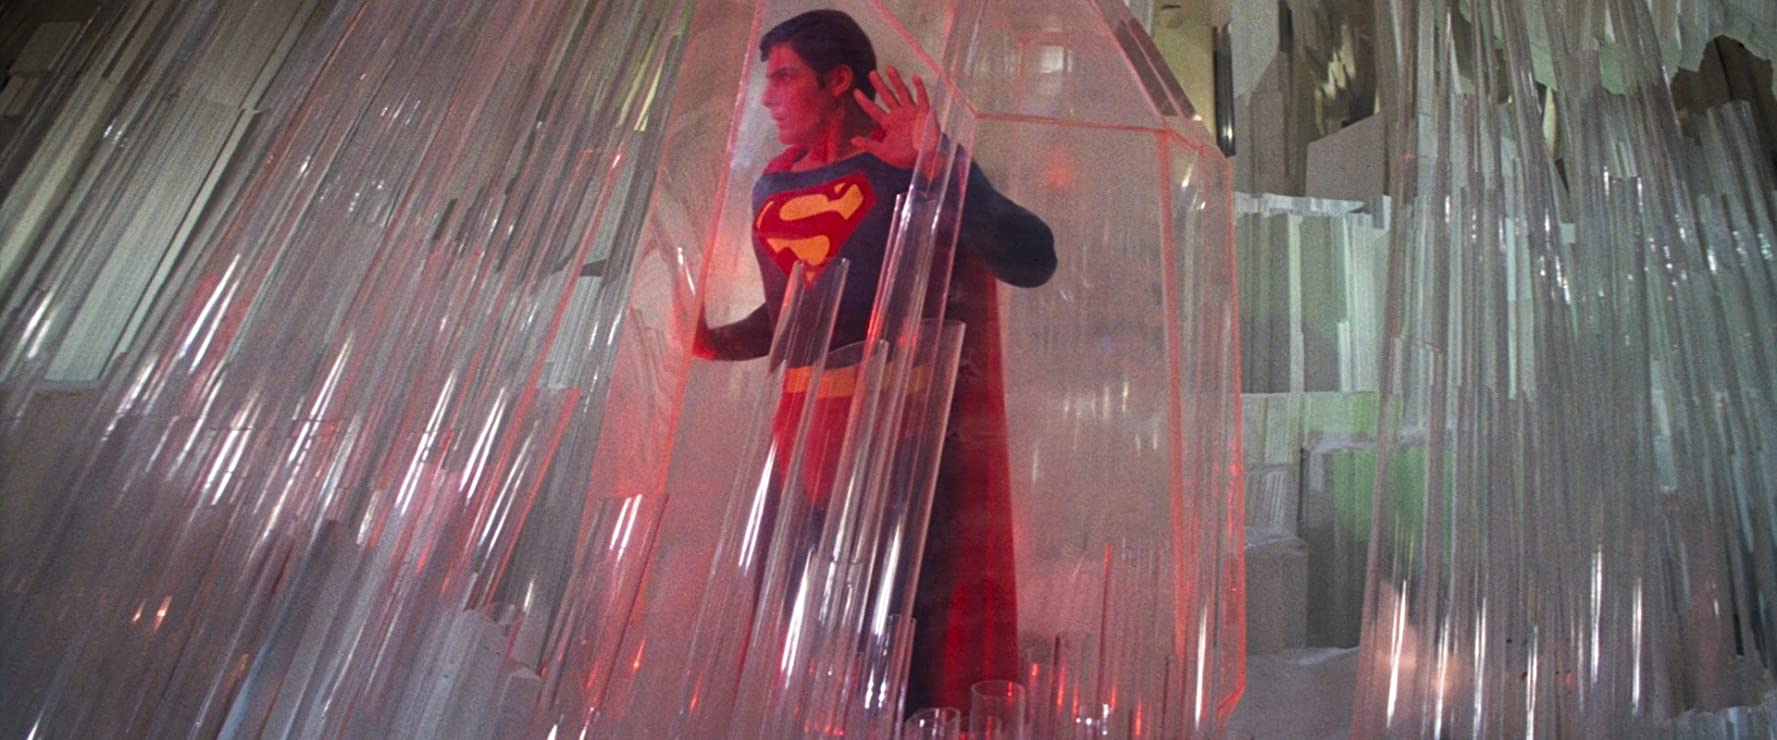 Christopher Reeve in Superman II (1980)